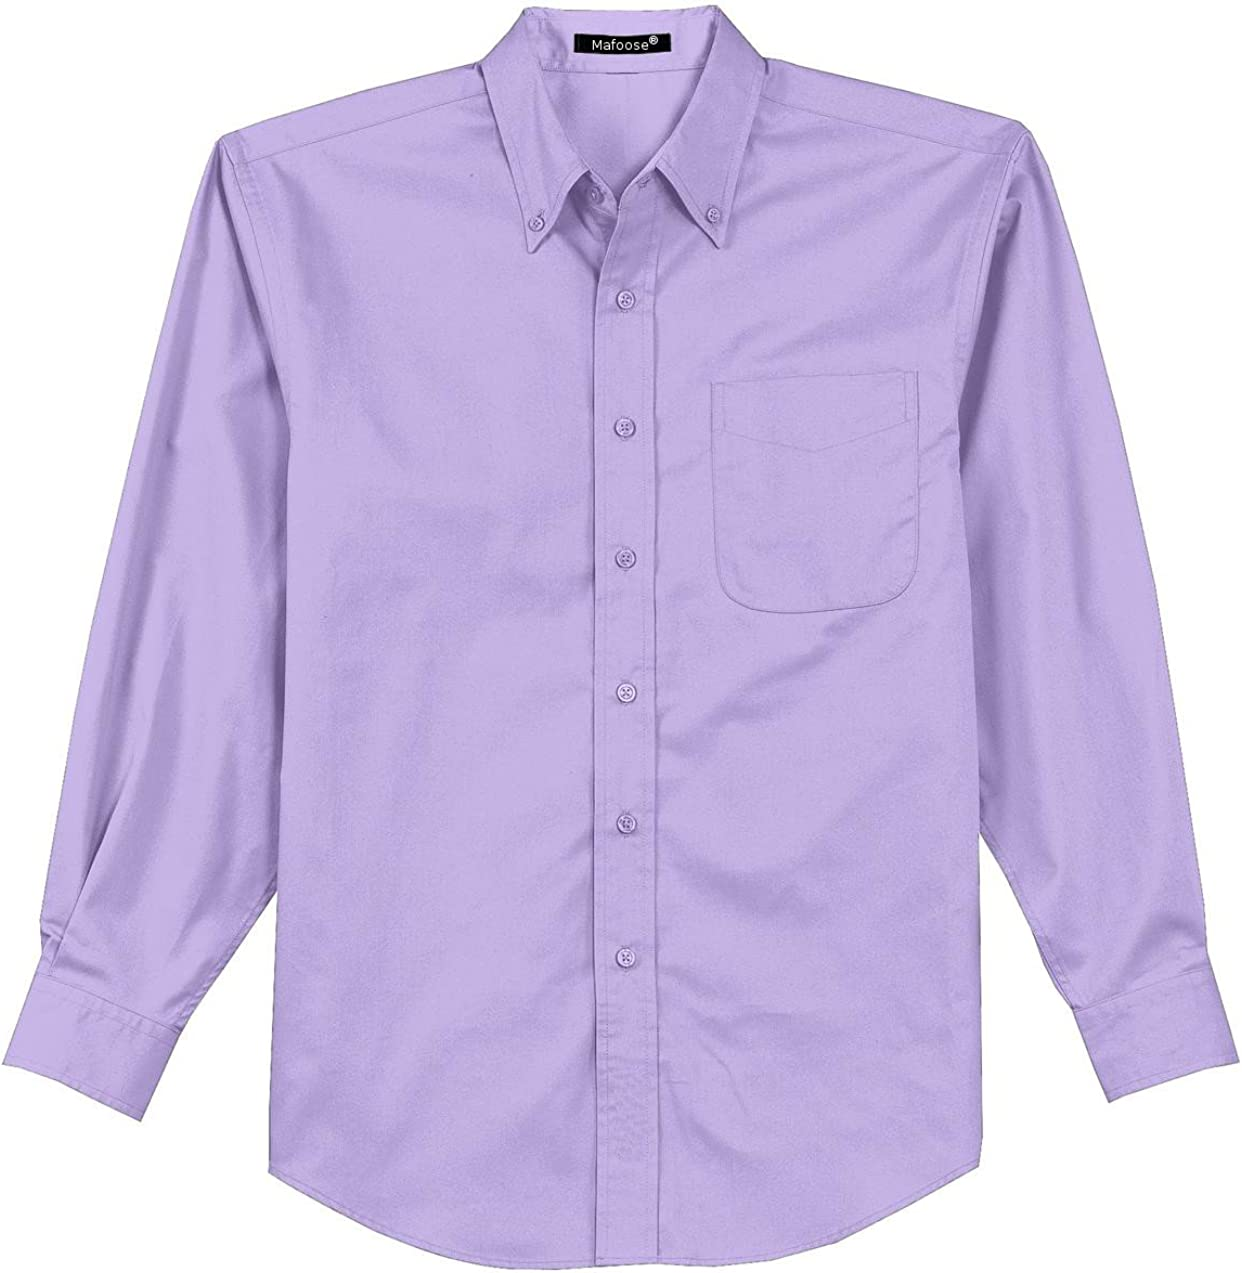 Mafoose Men's Tall Long Sleeve Easy Care Shirt